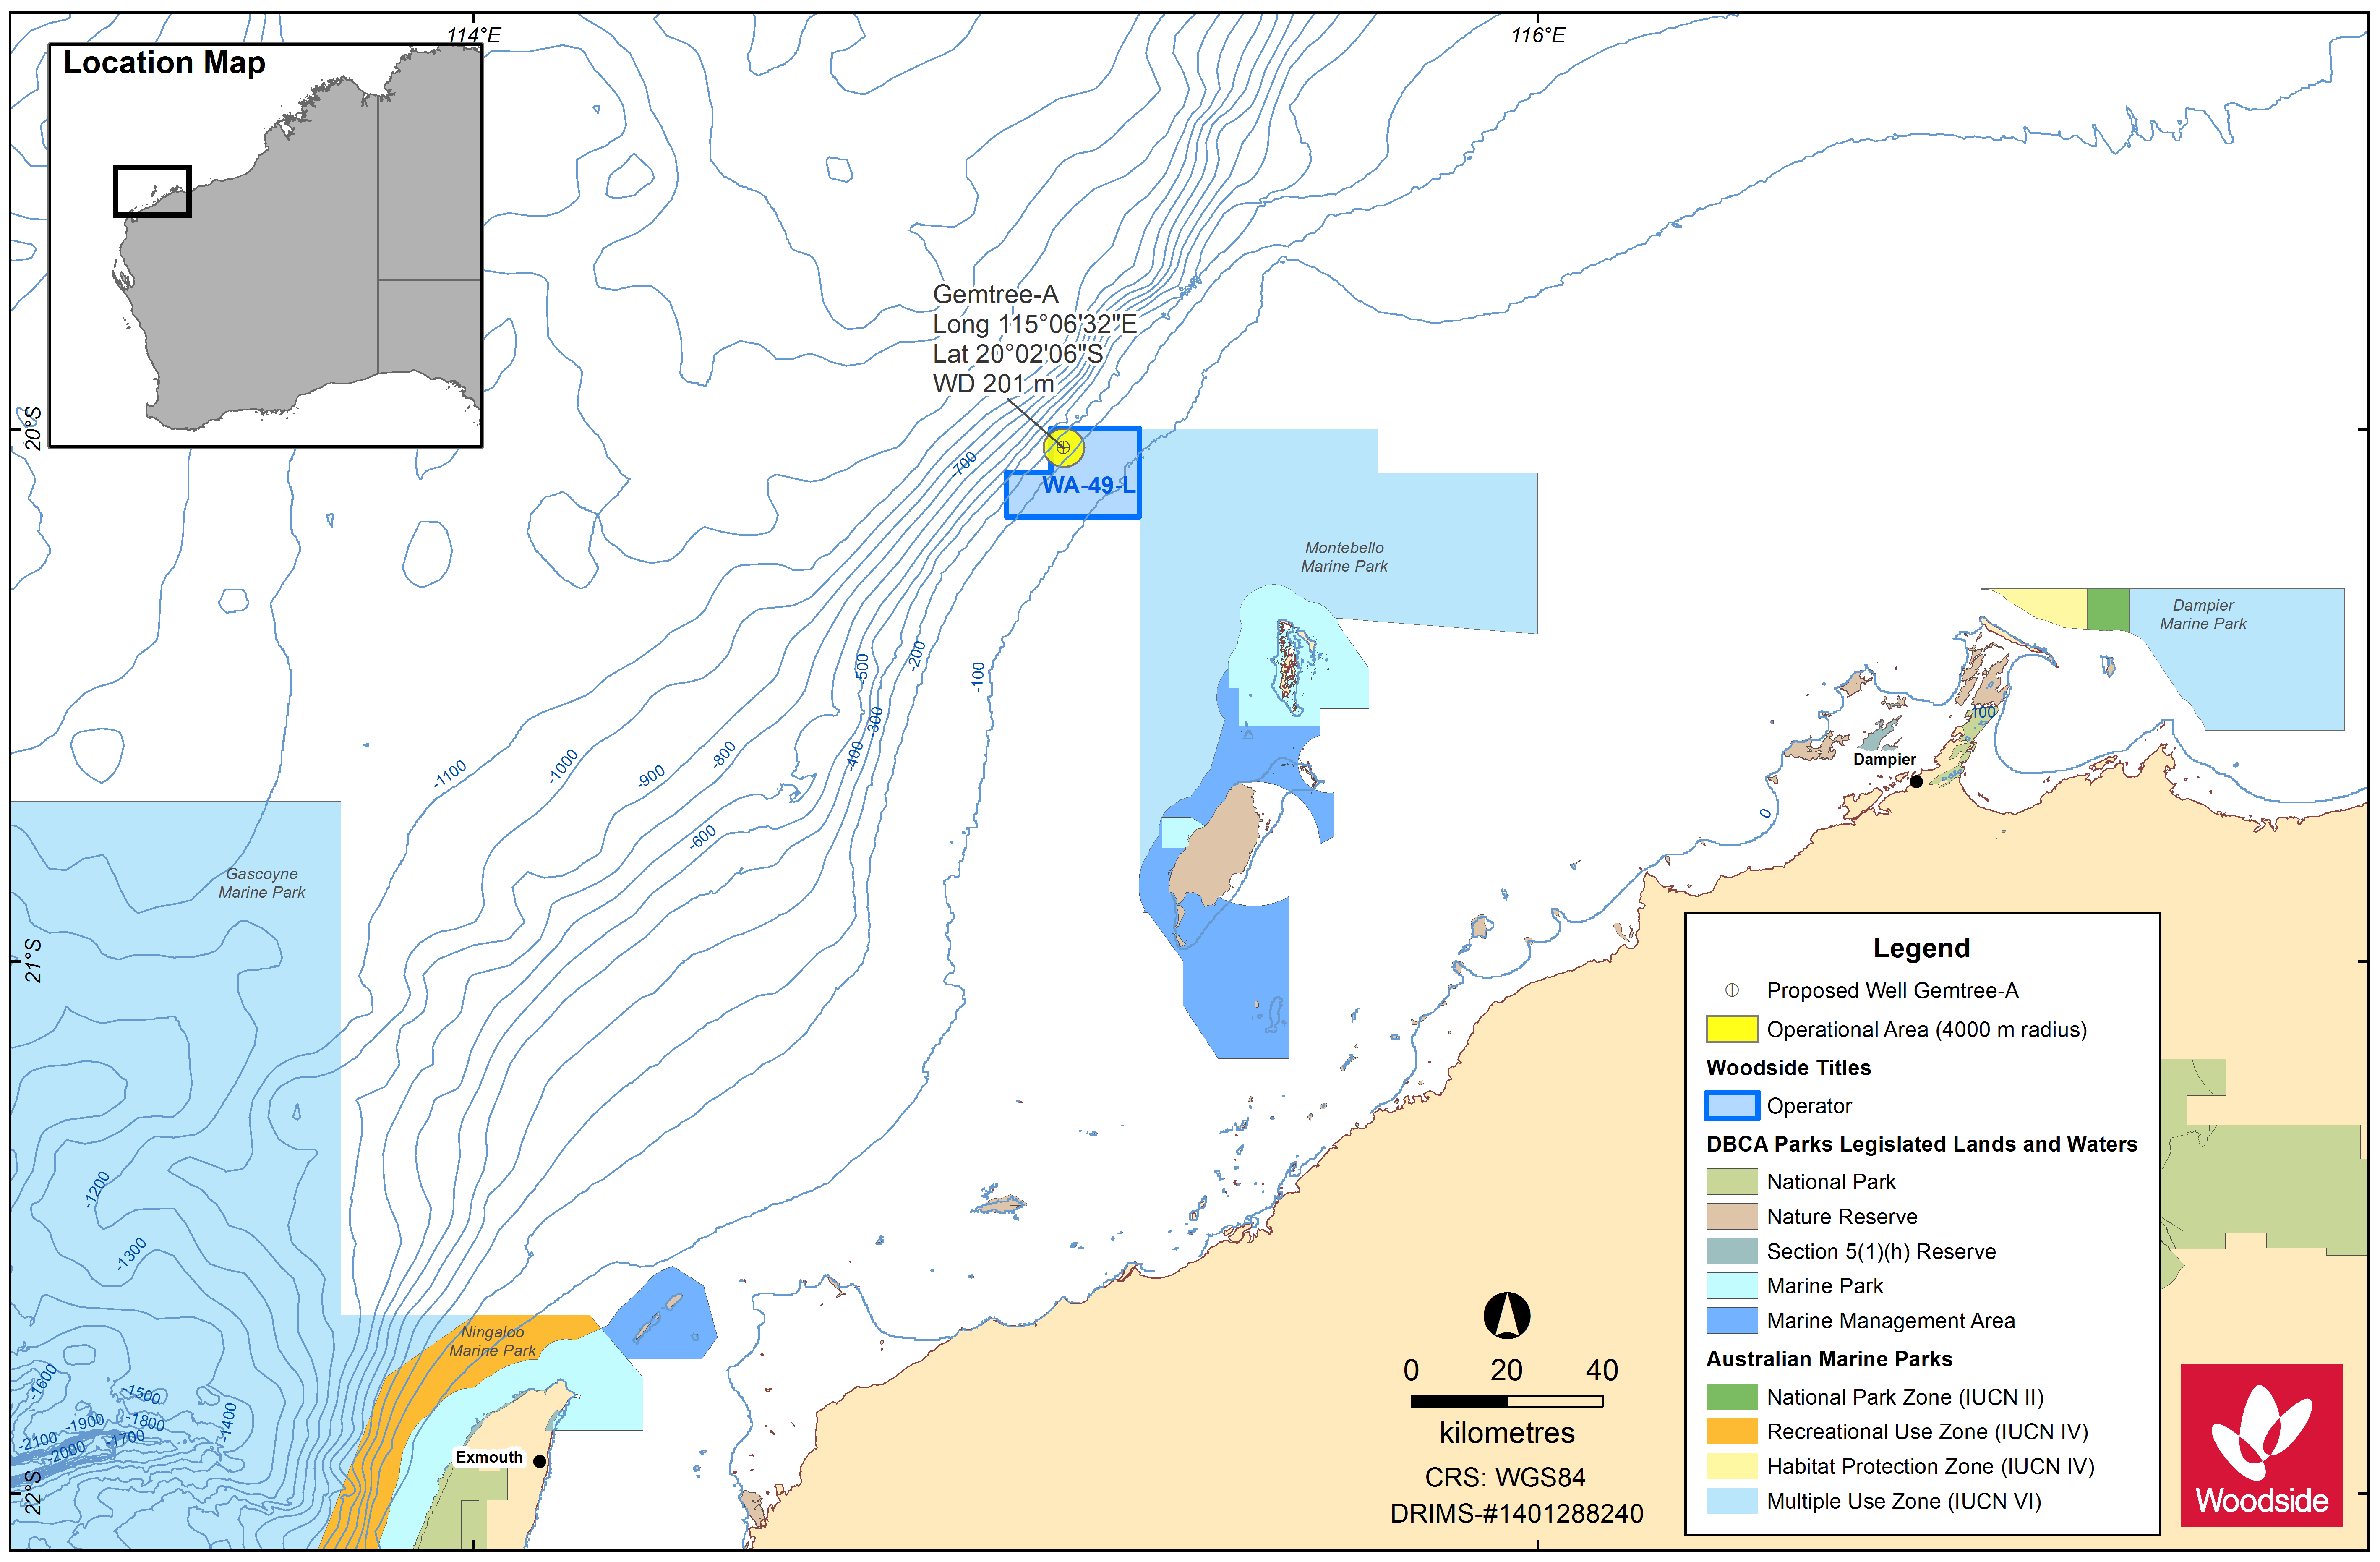 Location map - Activity: WA-49-L Gemtree Exploration Drilling  (refer to description)